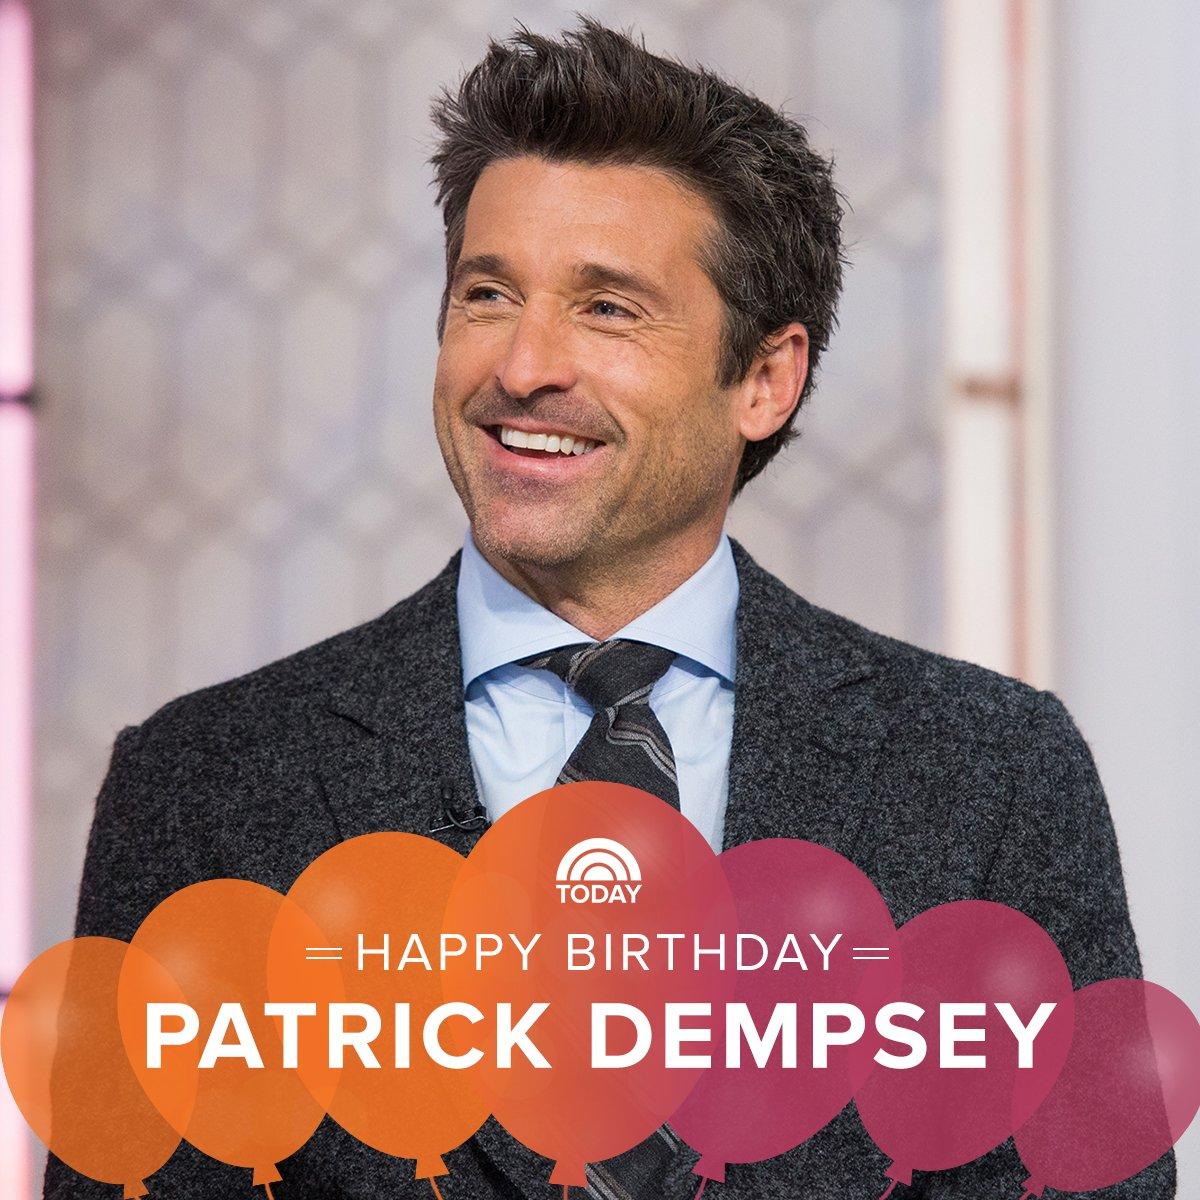 Patrick Dempsey Happy Birthday Patrick Dempsey Scoopnest